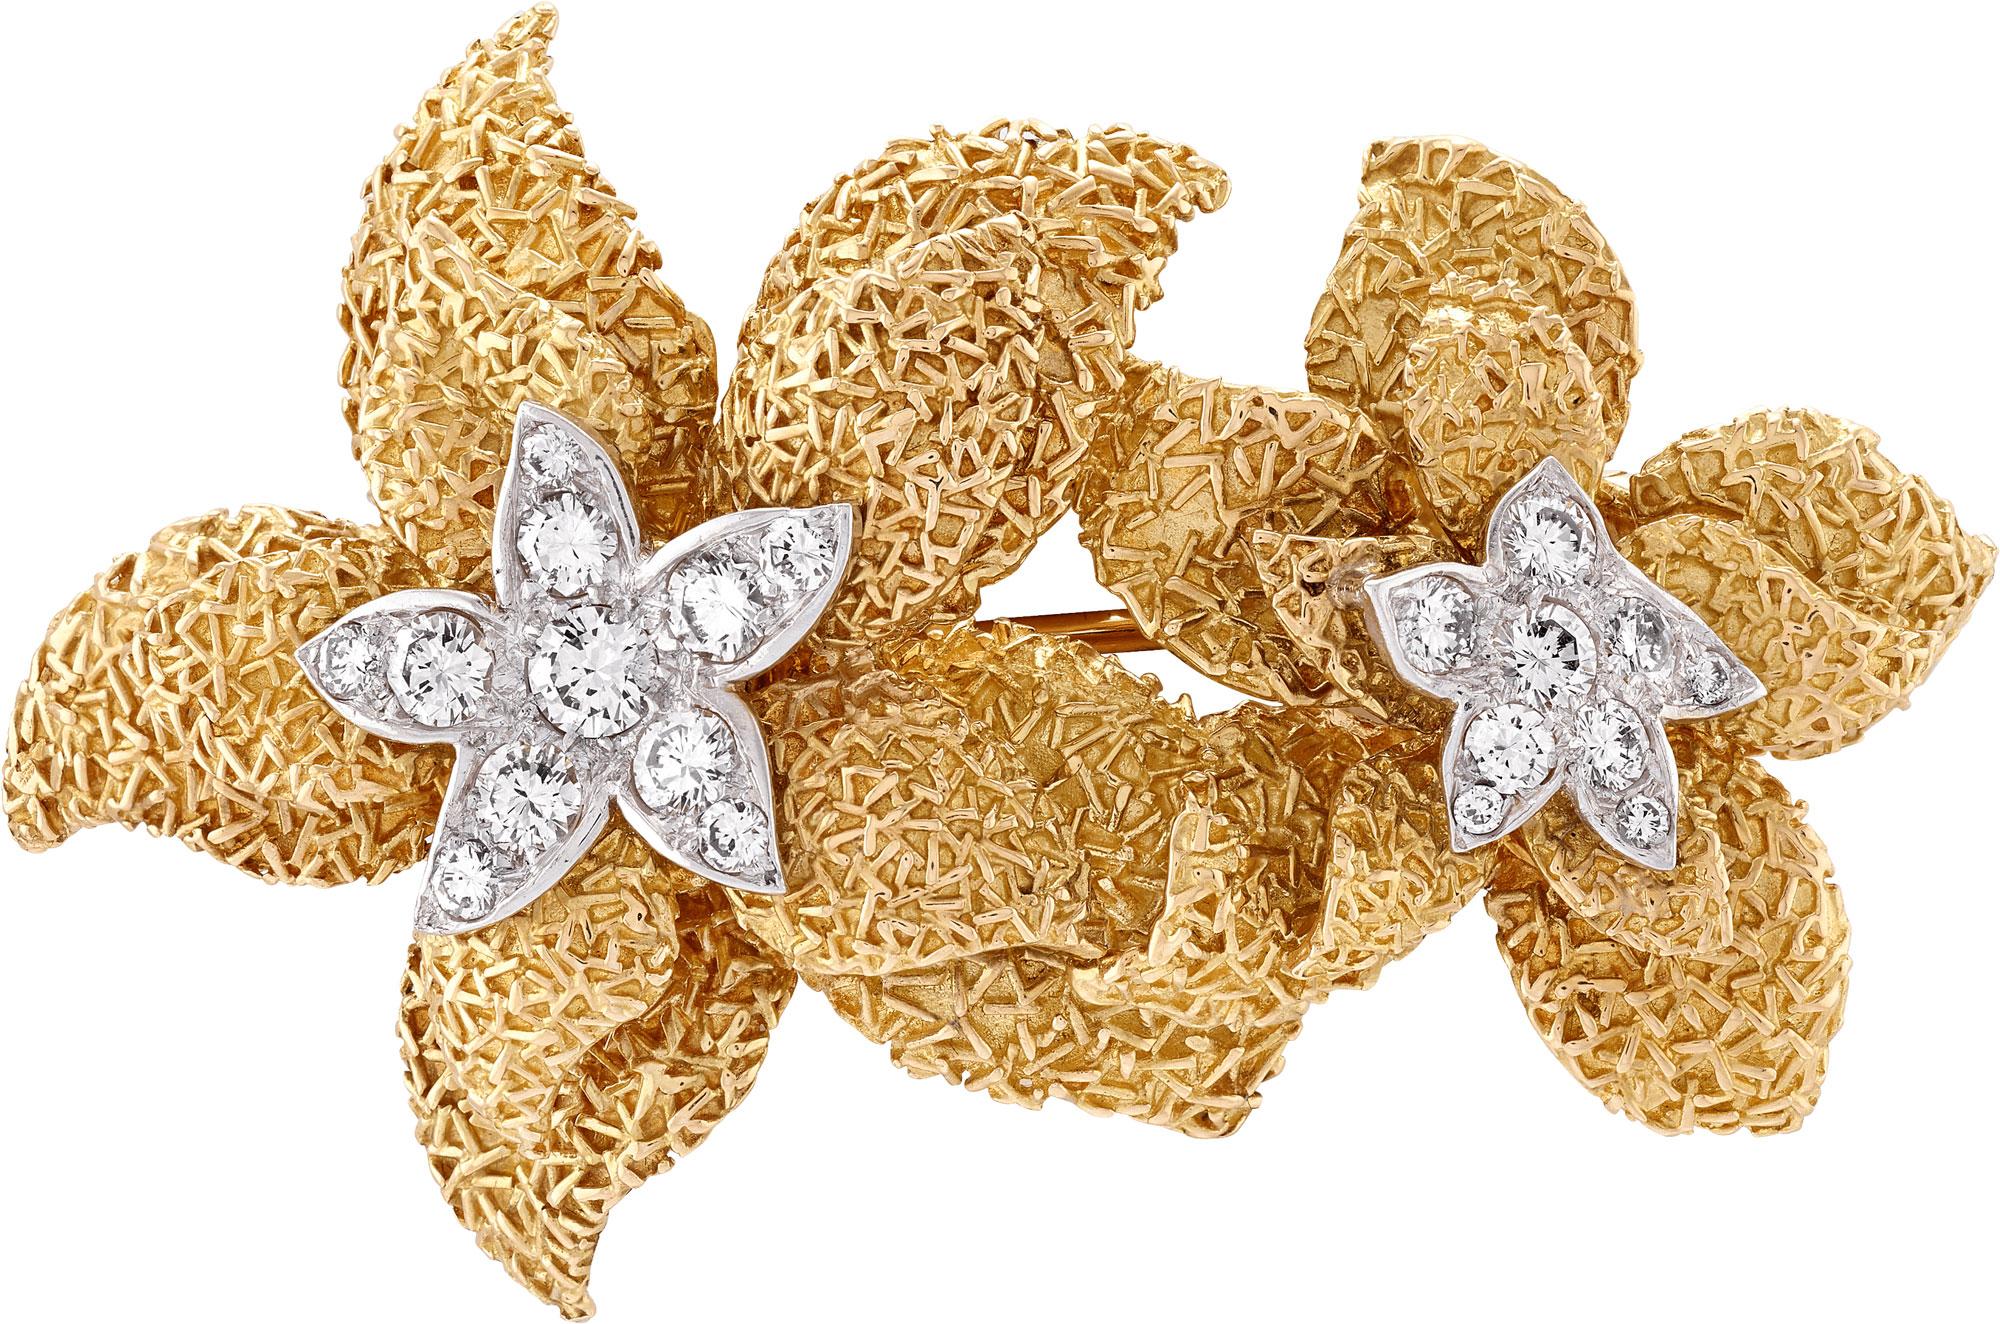 Clip e orecchini Narcisse,1968, Oro giallo, platino, diamanti Collezione Van Cleef & Arpels – Photo Credit: Van Cleef & Arpels